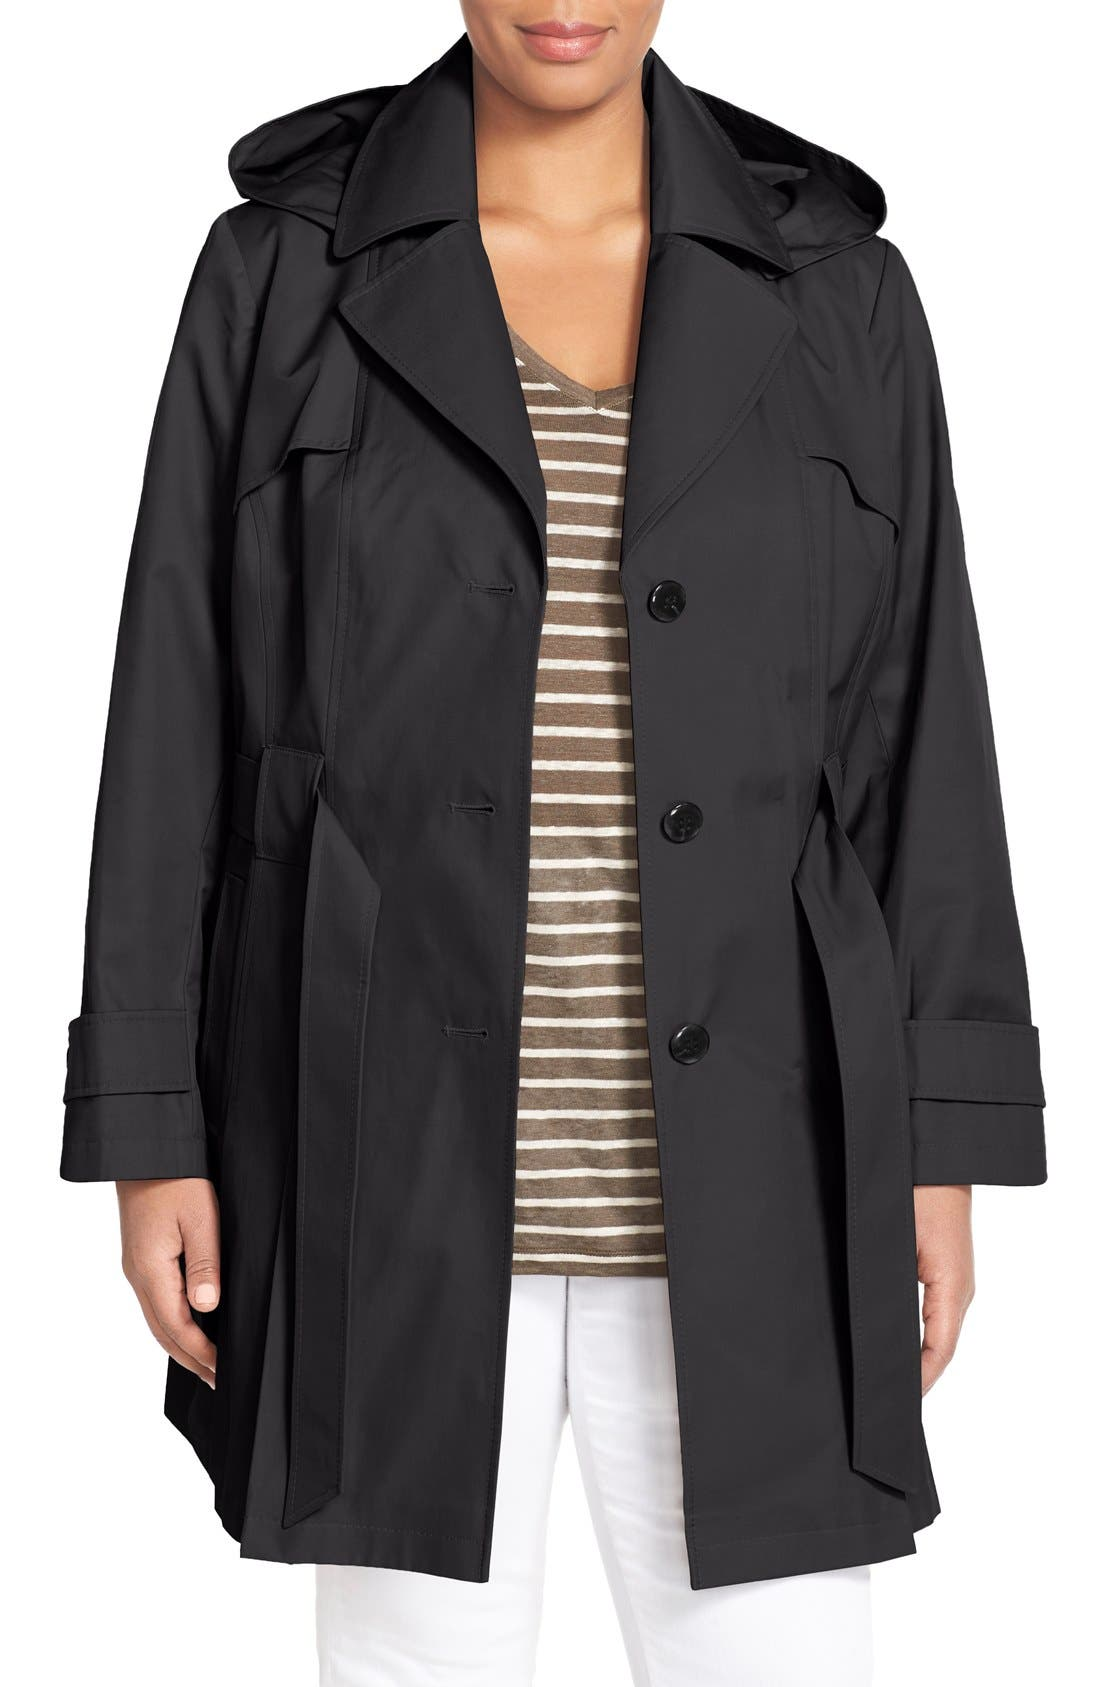 Main Image - Via Spiga 'Scarpa' Single Breasted Trench Coat (Plus Size)